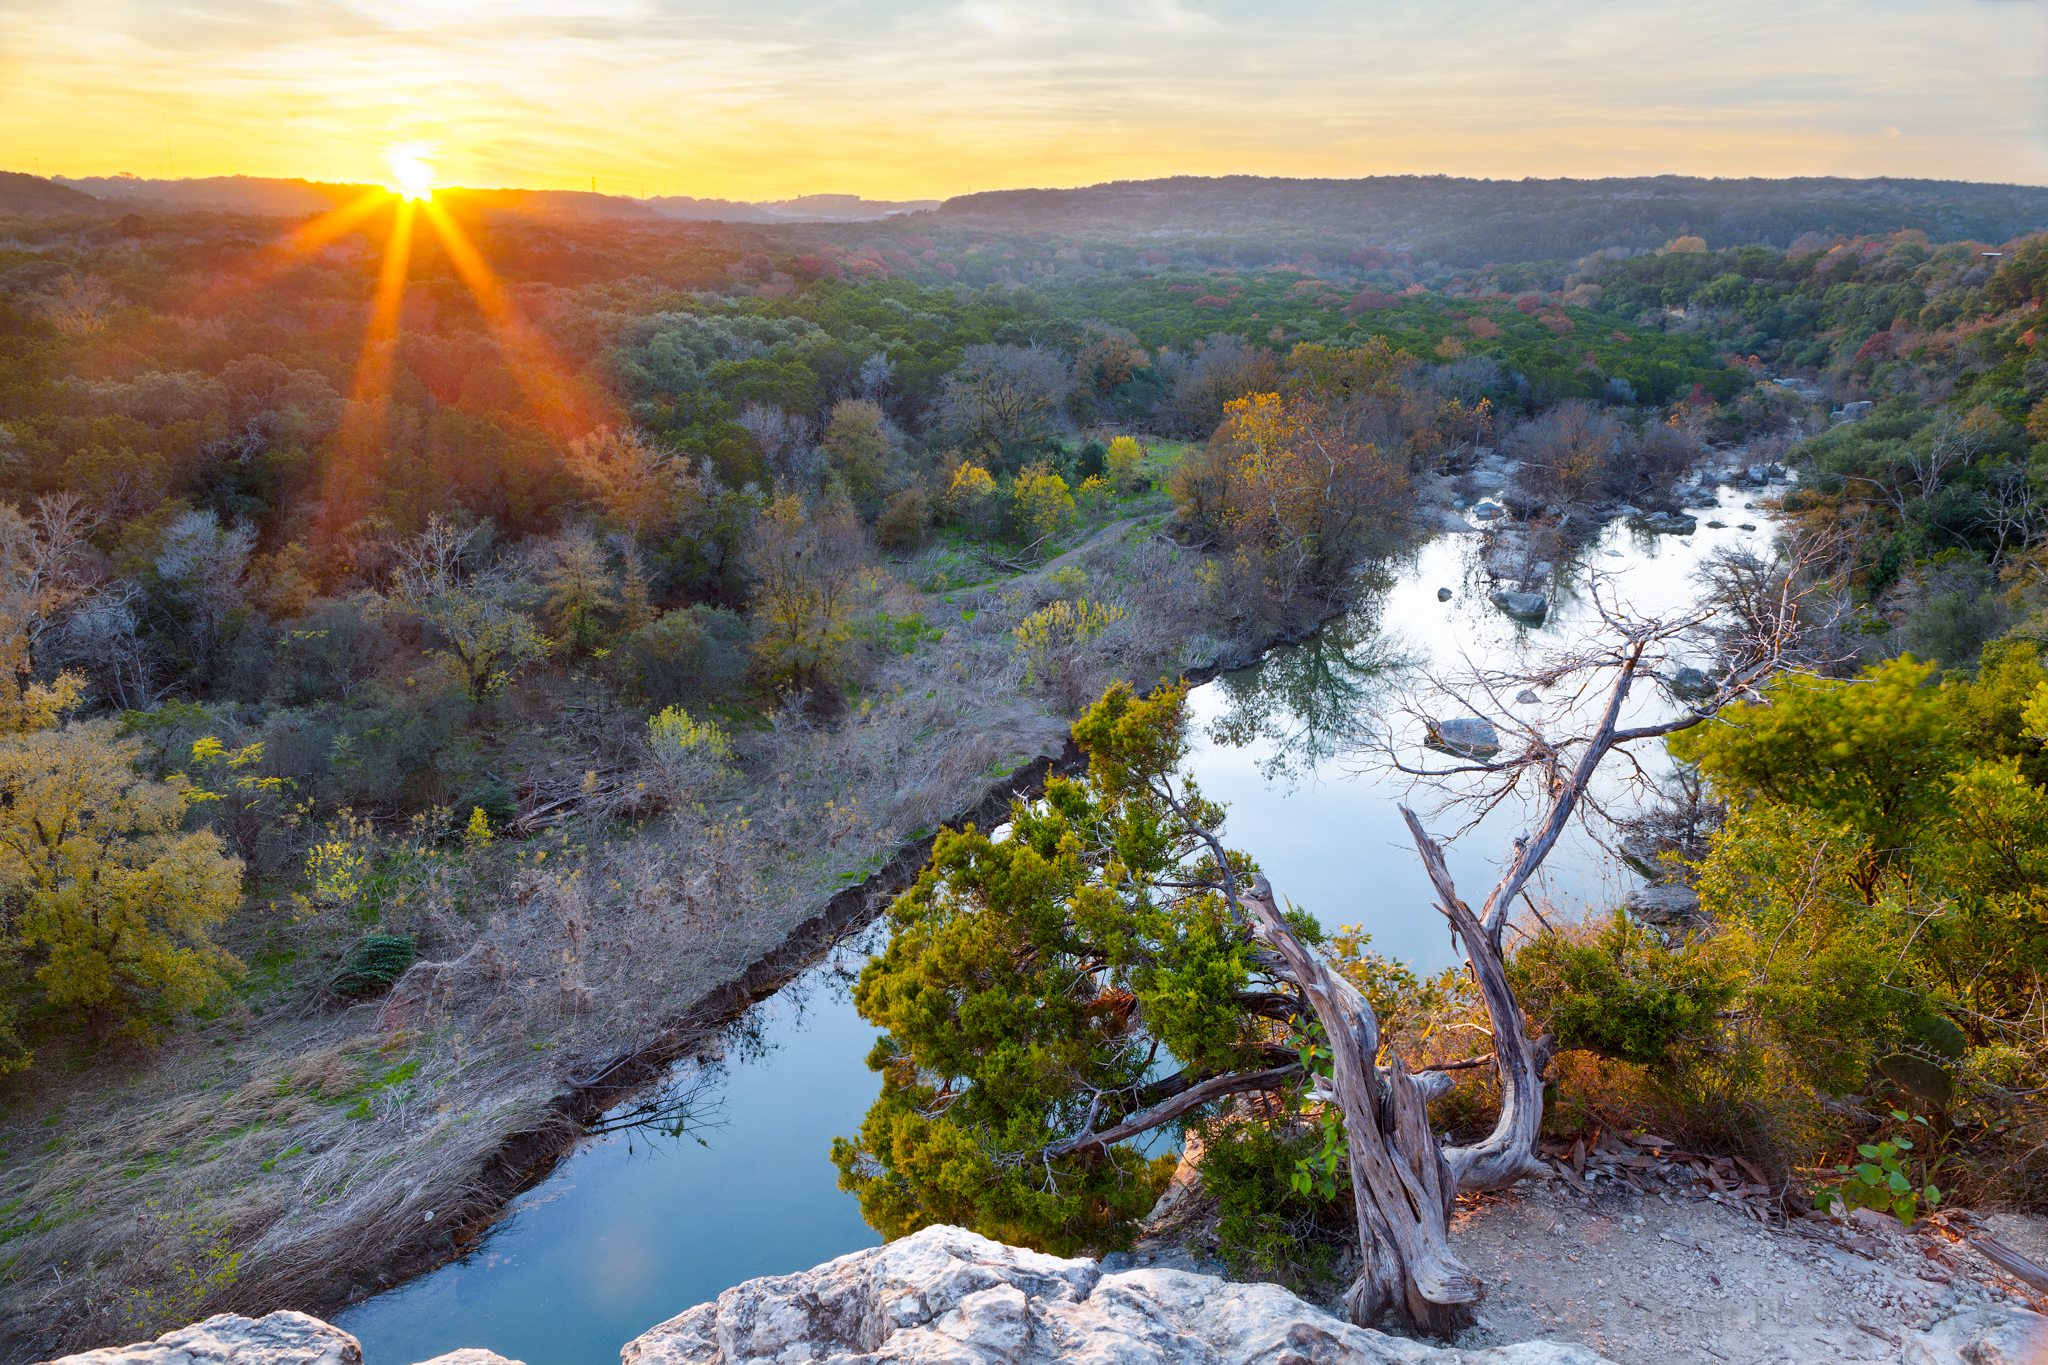 Natural Starburst captured in-camera over the Greenbelt in Austin, Texas